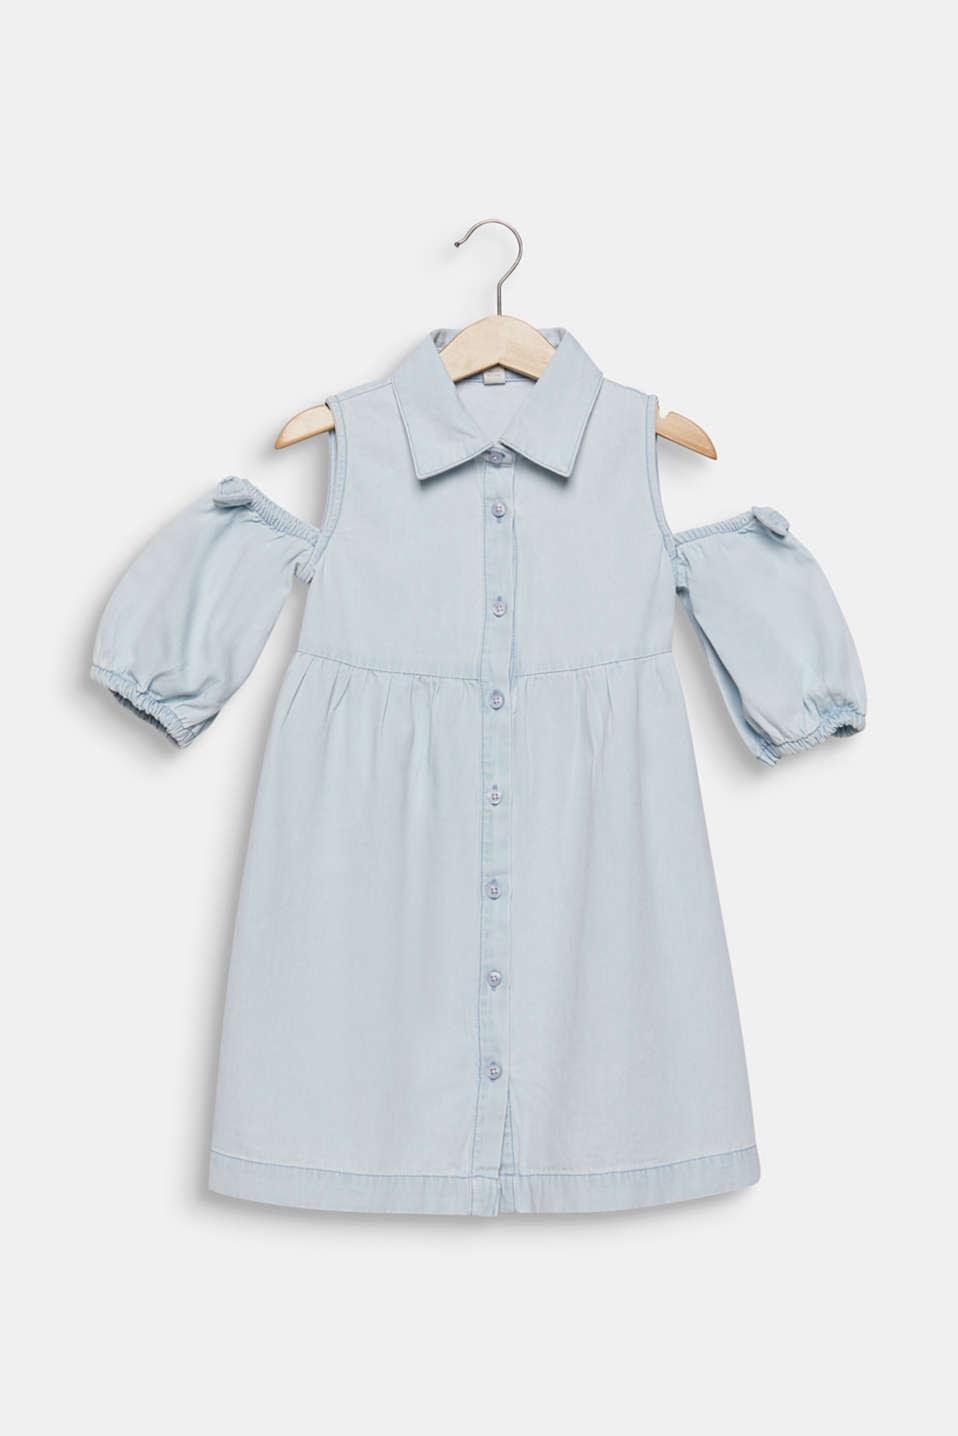 Denim dress with cut-out shoulders, cotton, LIGHT INDIGO D, detail image number 0